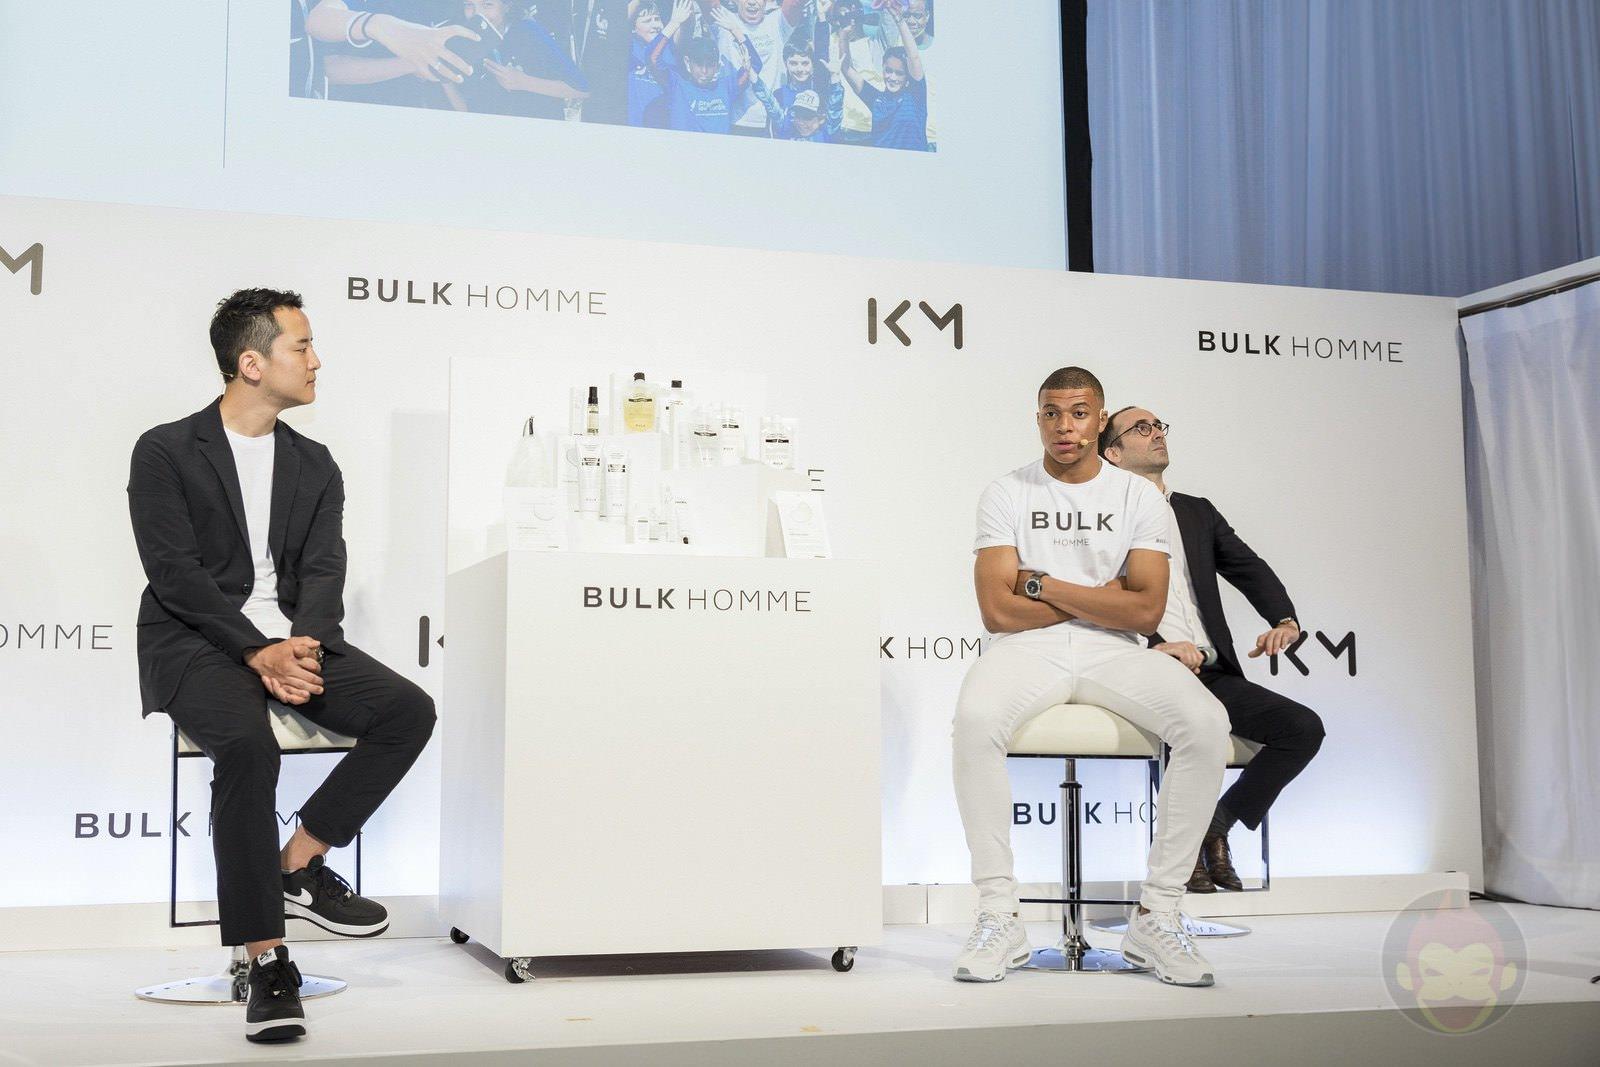 Bulk Homme Global Partnership Presentation 28